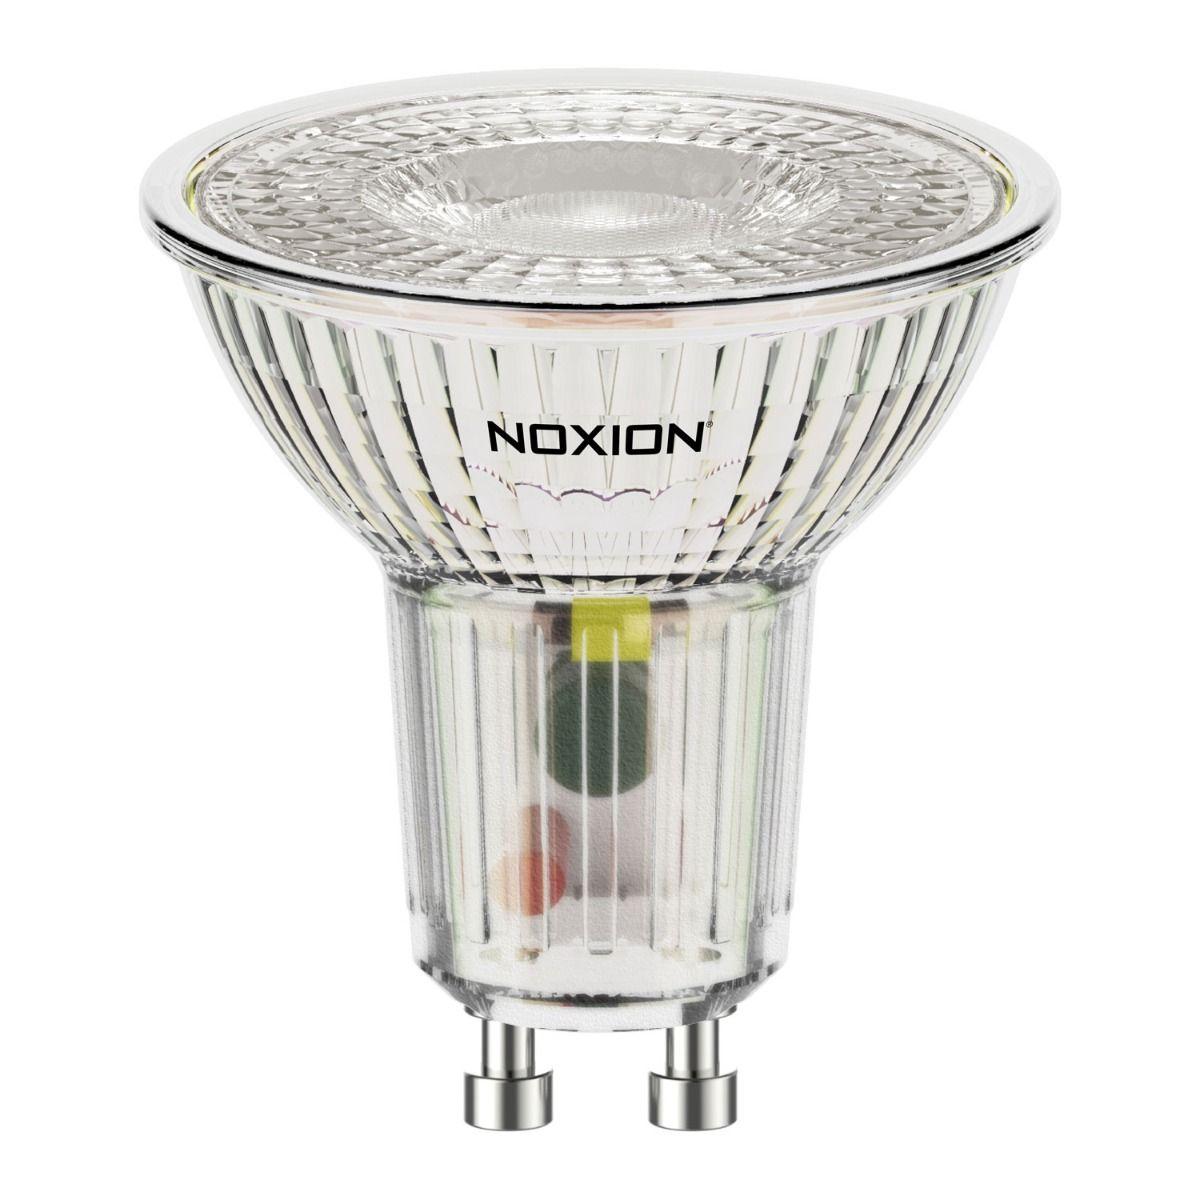 Noxion LED Spot GU10 3.7W 827 36D 260lm | Vervanger voor 35W